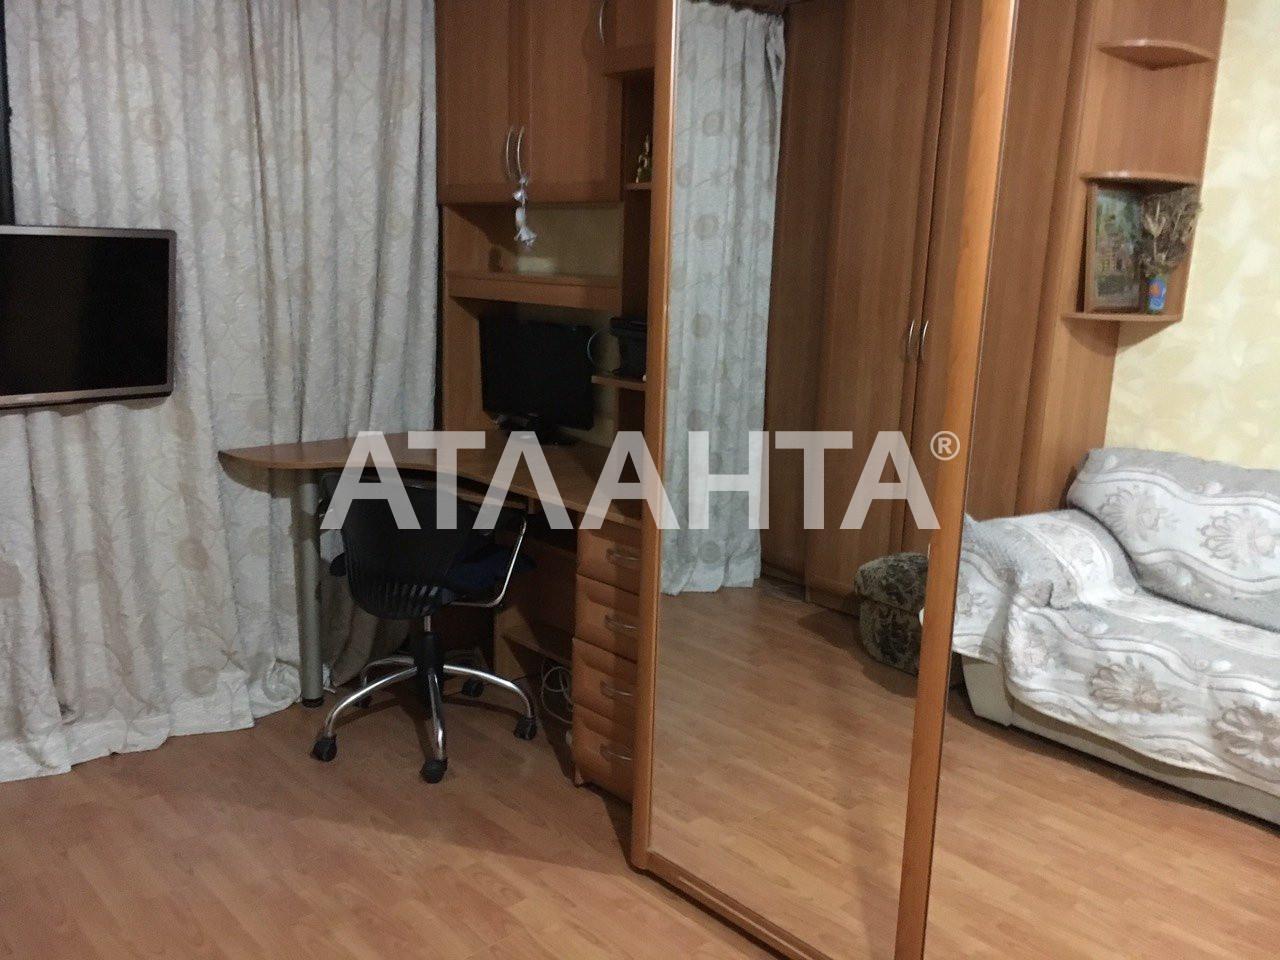 Продается 1-комнатная Квартира на ул. Проспект Космонавта Комарова — 26 000 у.е. (фото №3)